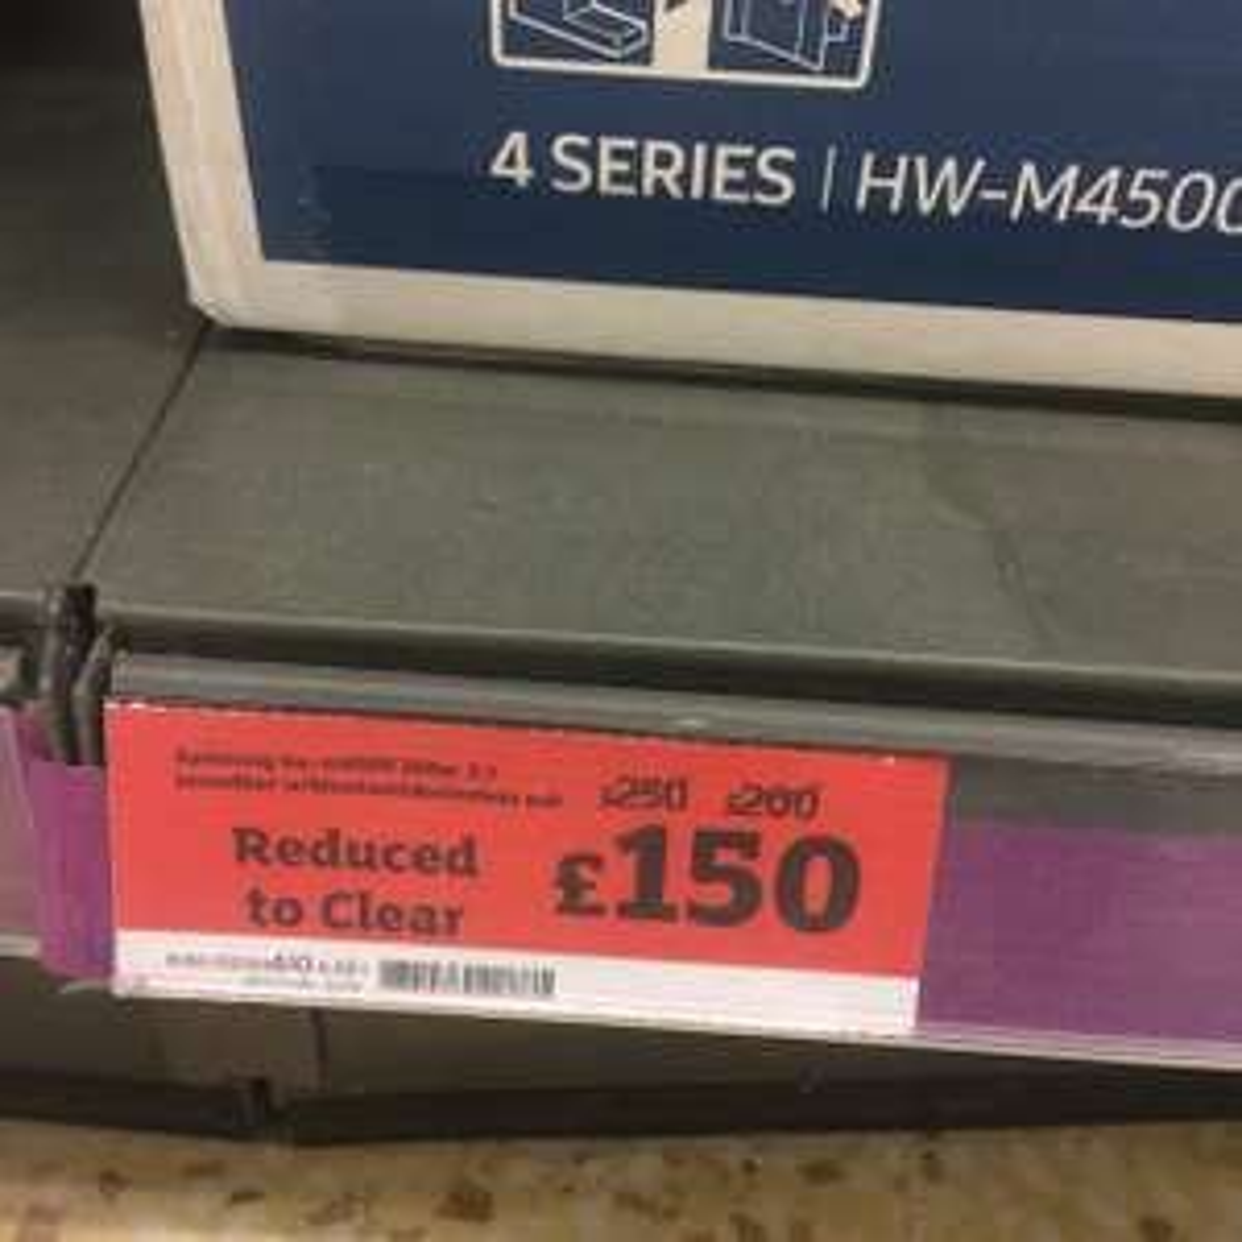 samsung hw-m4500 soundbar and subwoofer instore at Sainsbury's for £150